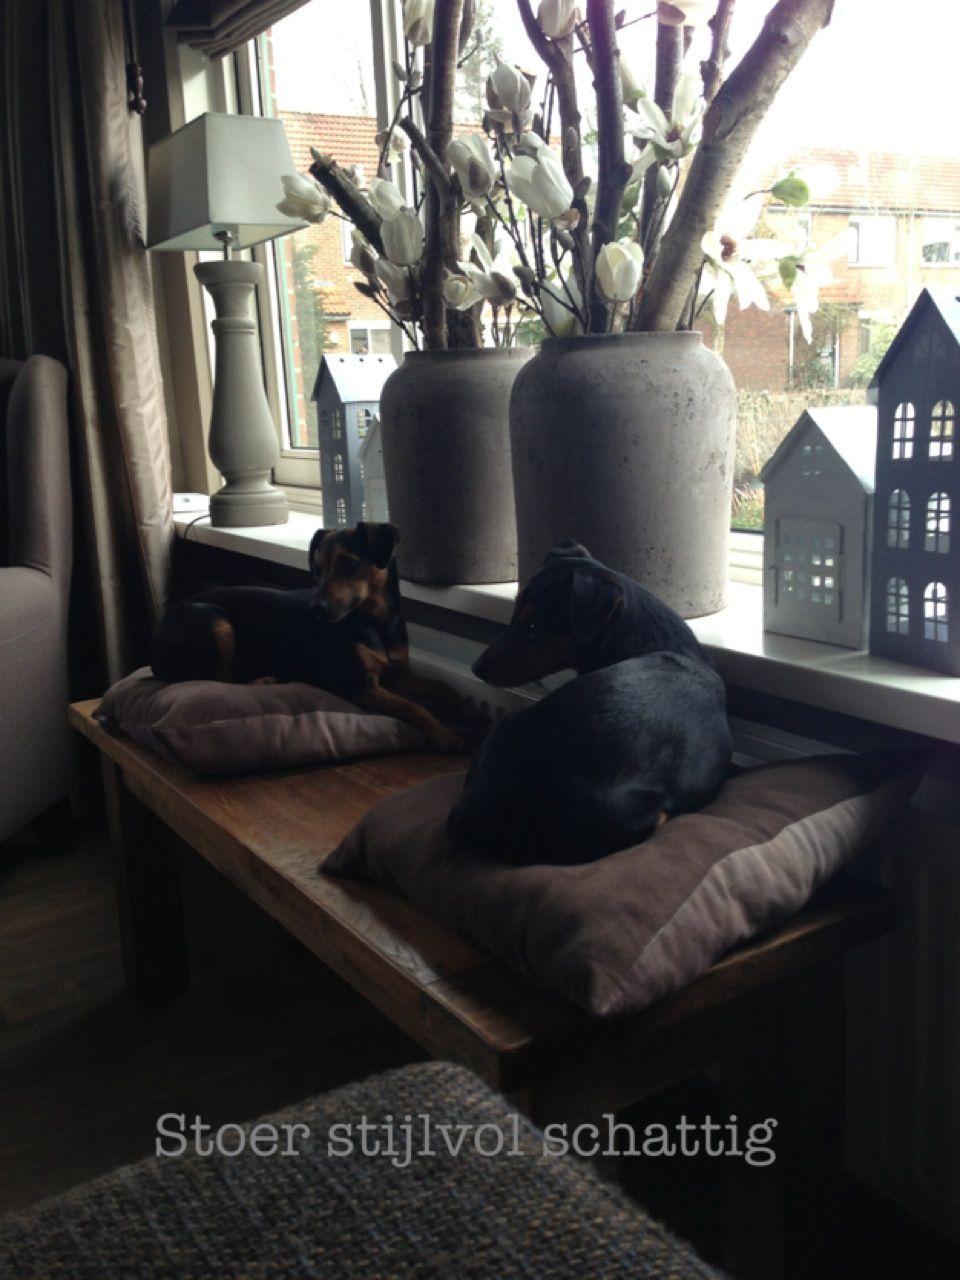 Pin van janny op vensterbank pinterest escaparates for Decoratie vensterbank woonkamer